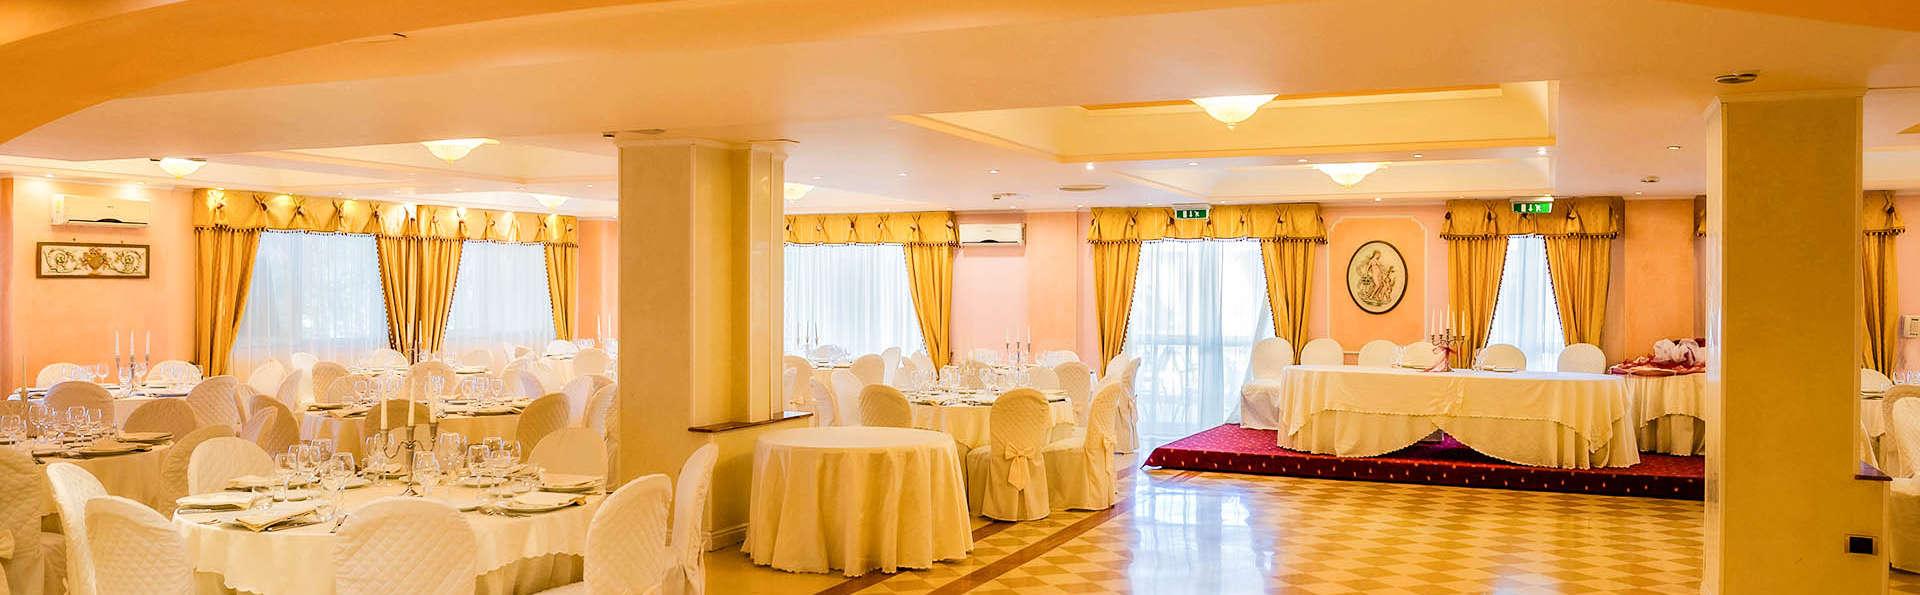 Grand Hotel Osman - EDIT_RESTAURANT_17.jpg